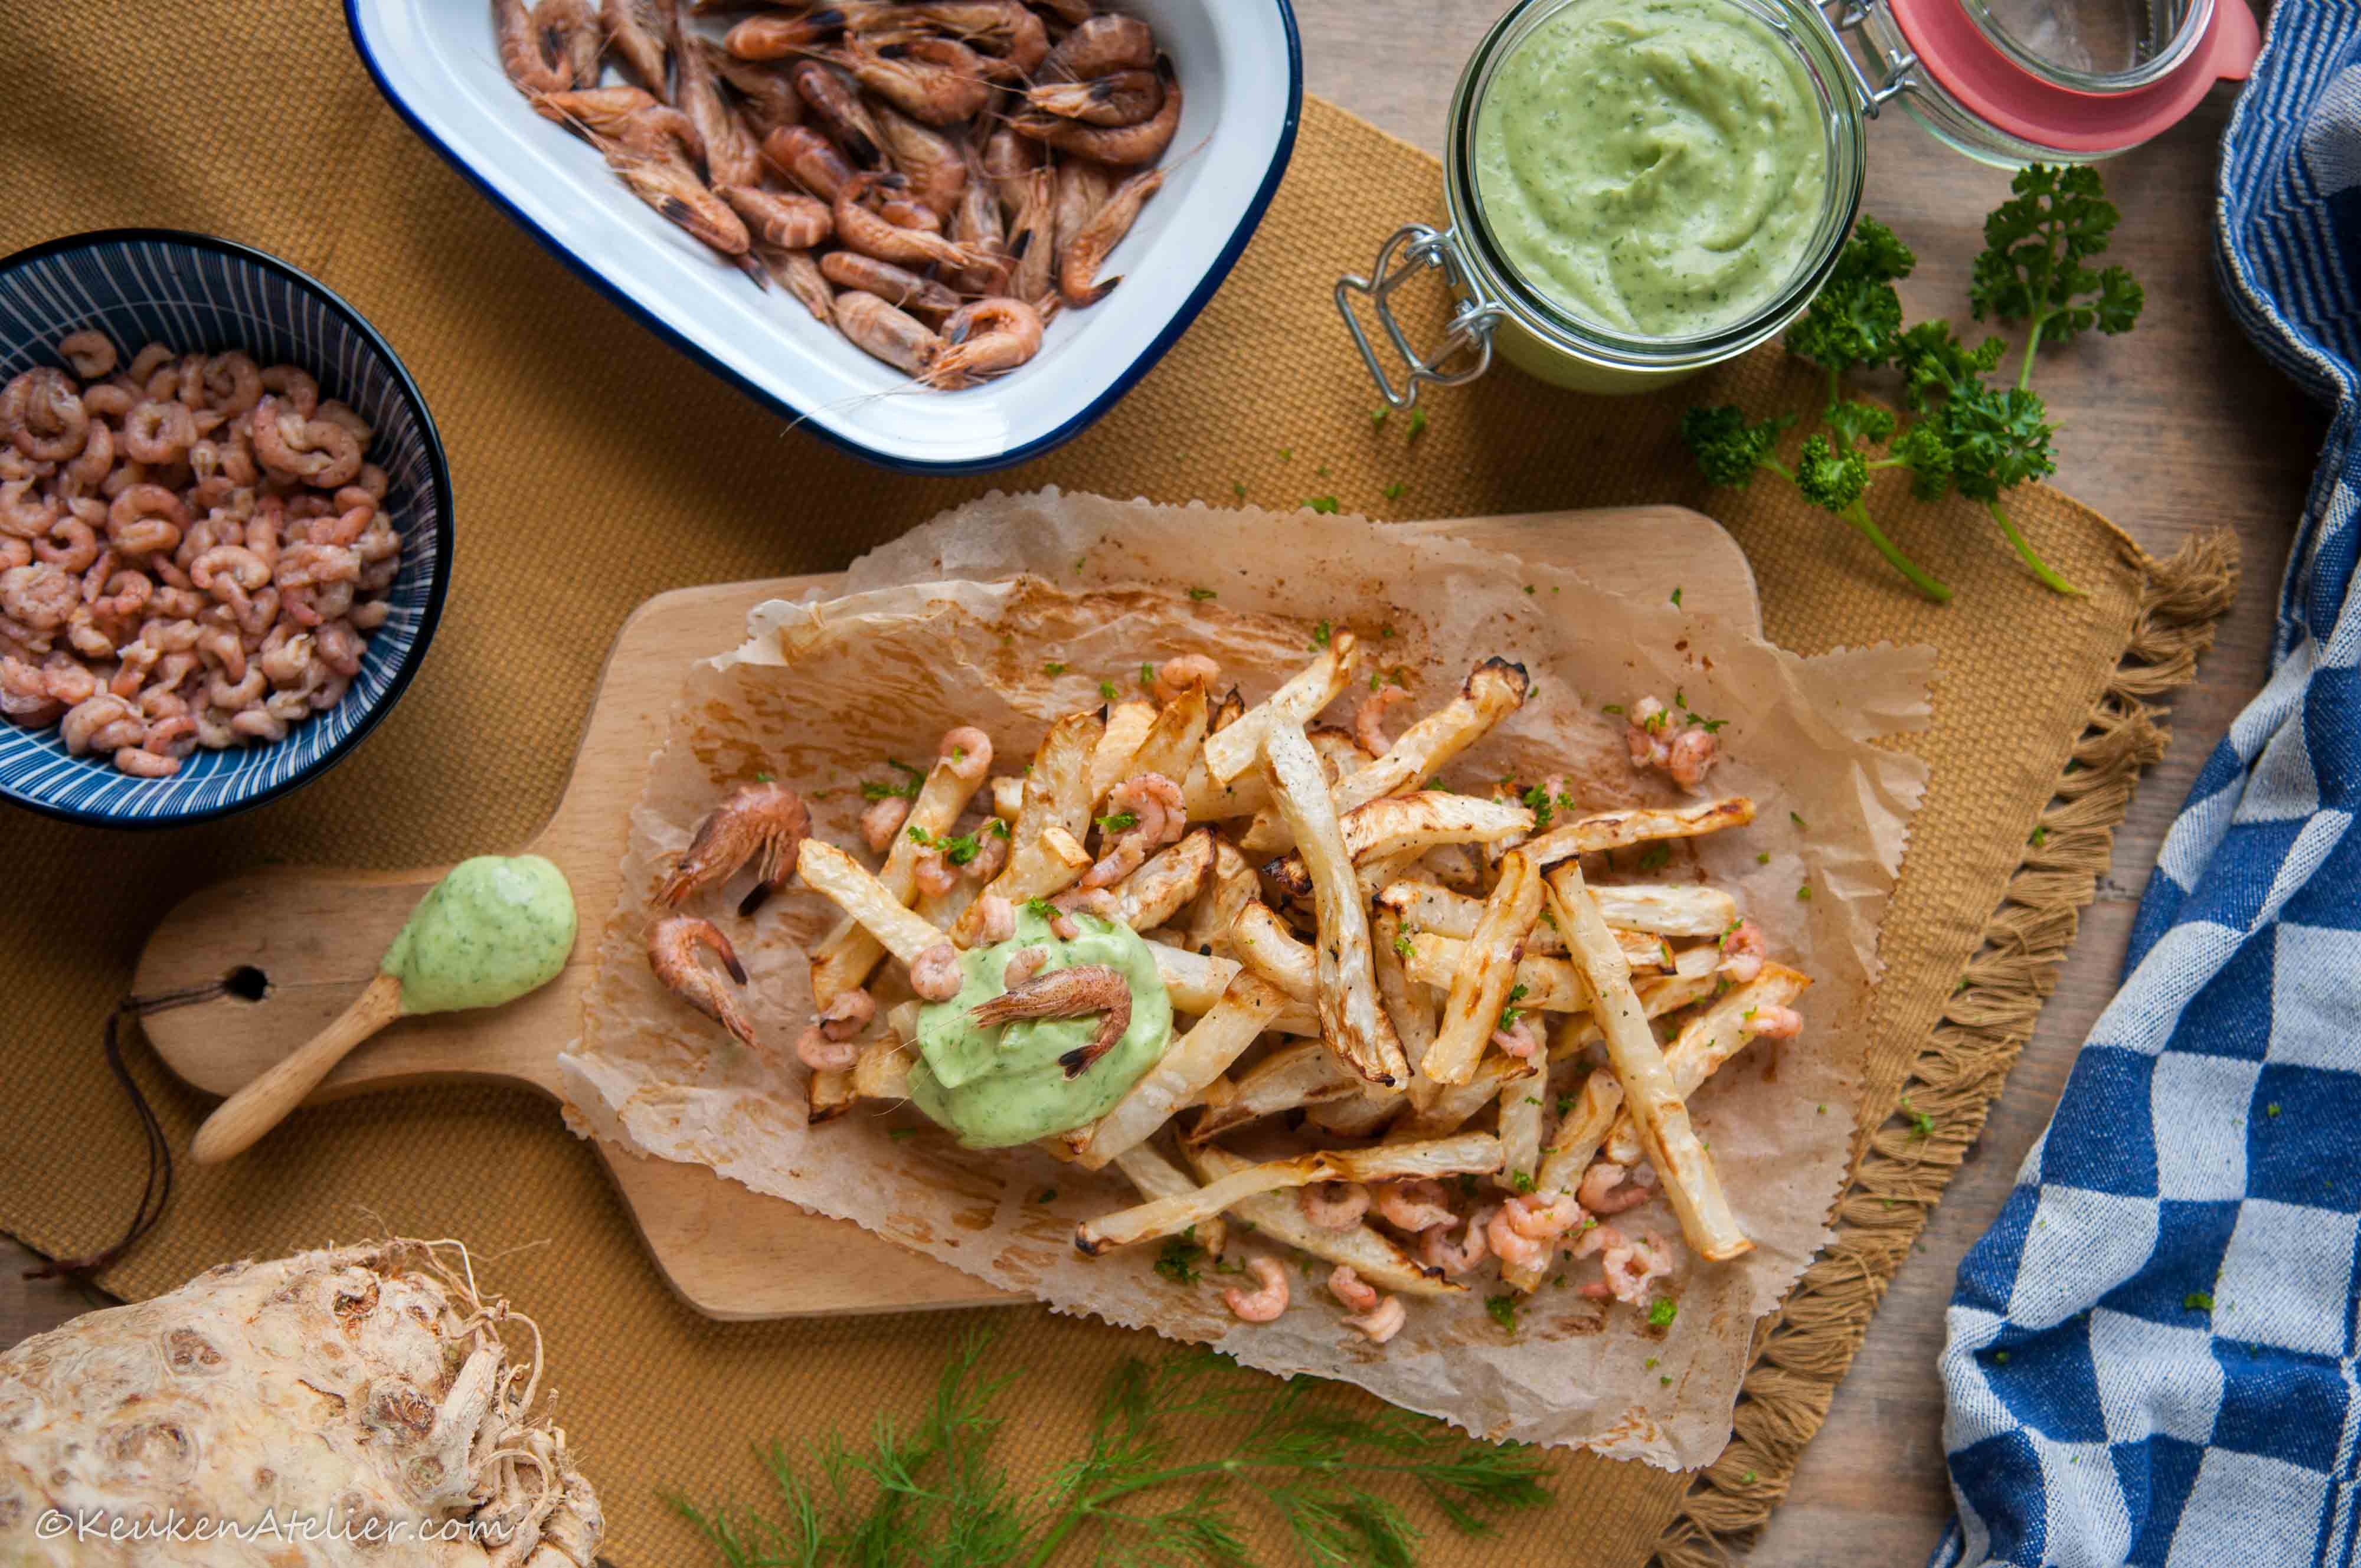 Knolselderij friet met Hollandse garnaal en kruidenmayonaise | KeukenAtelier.com